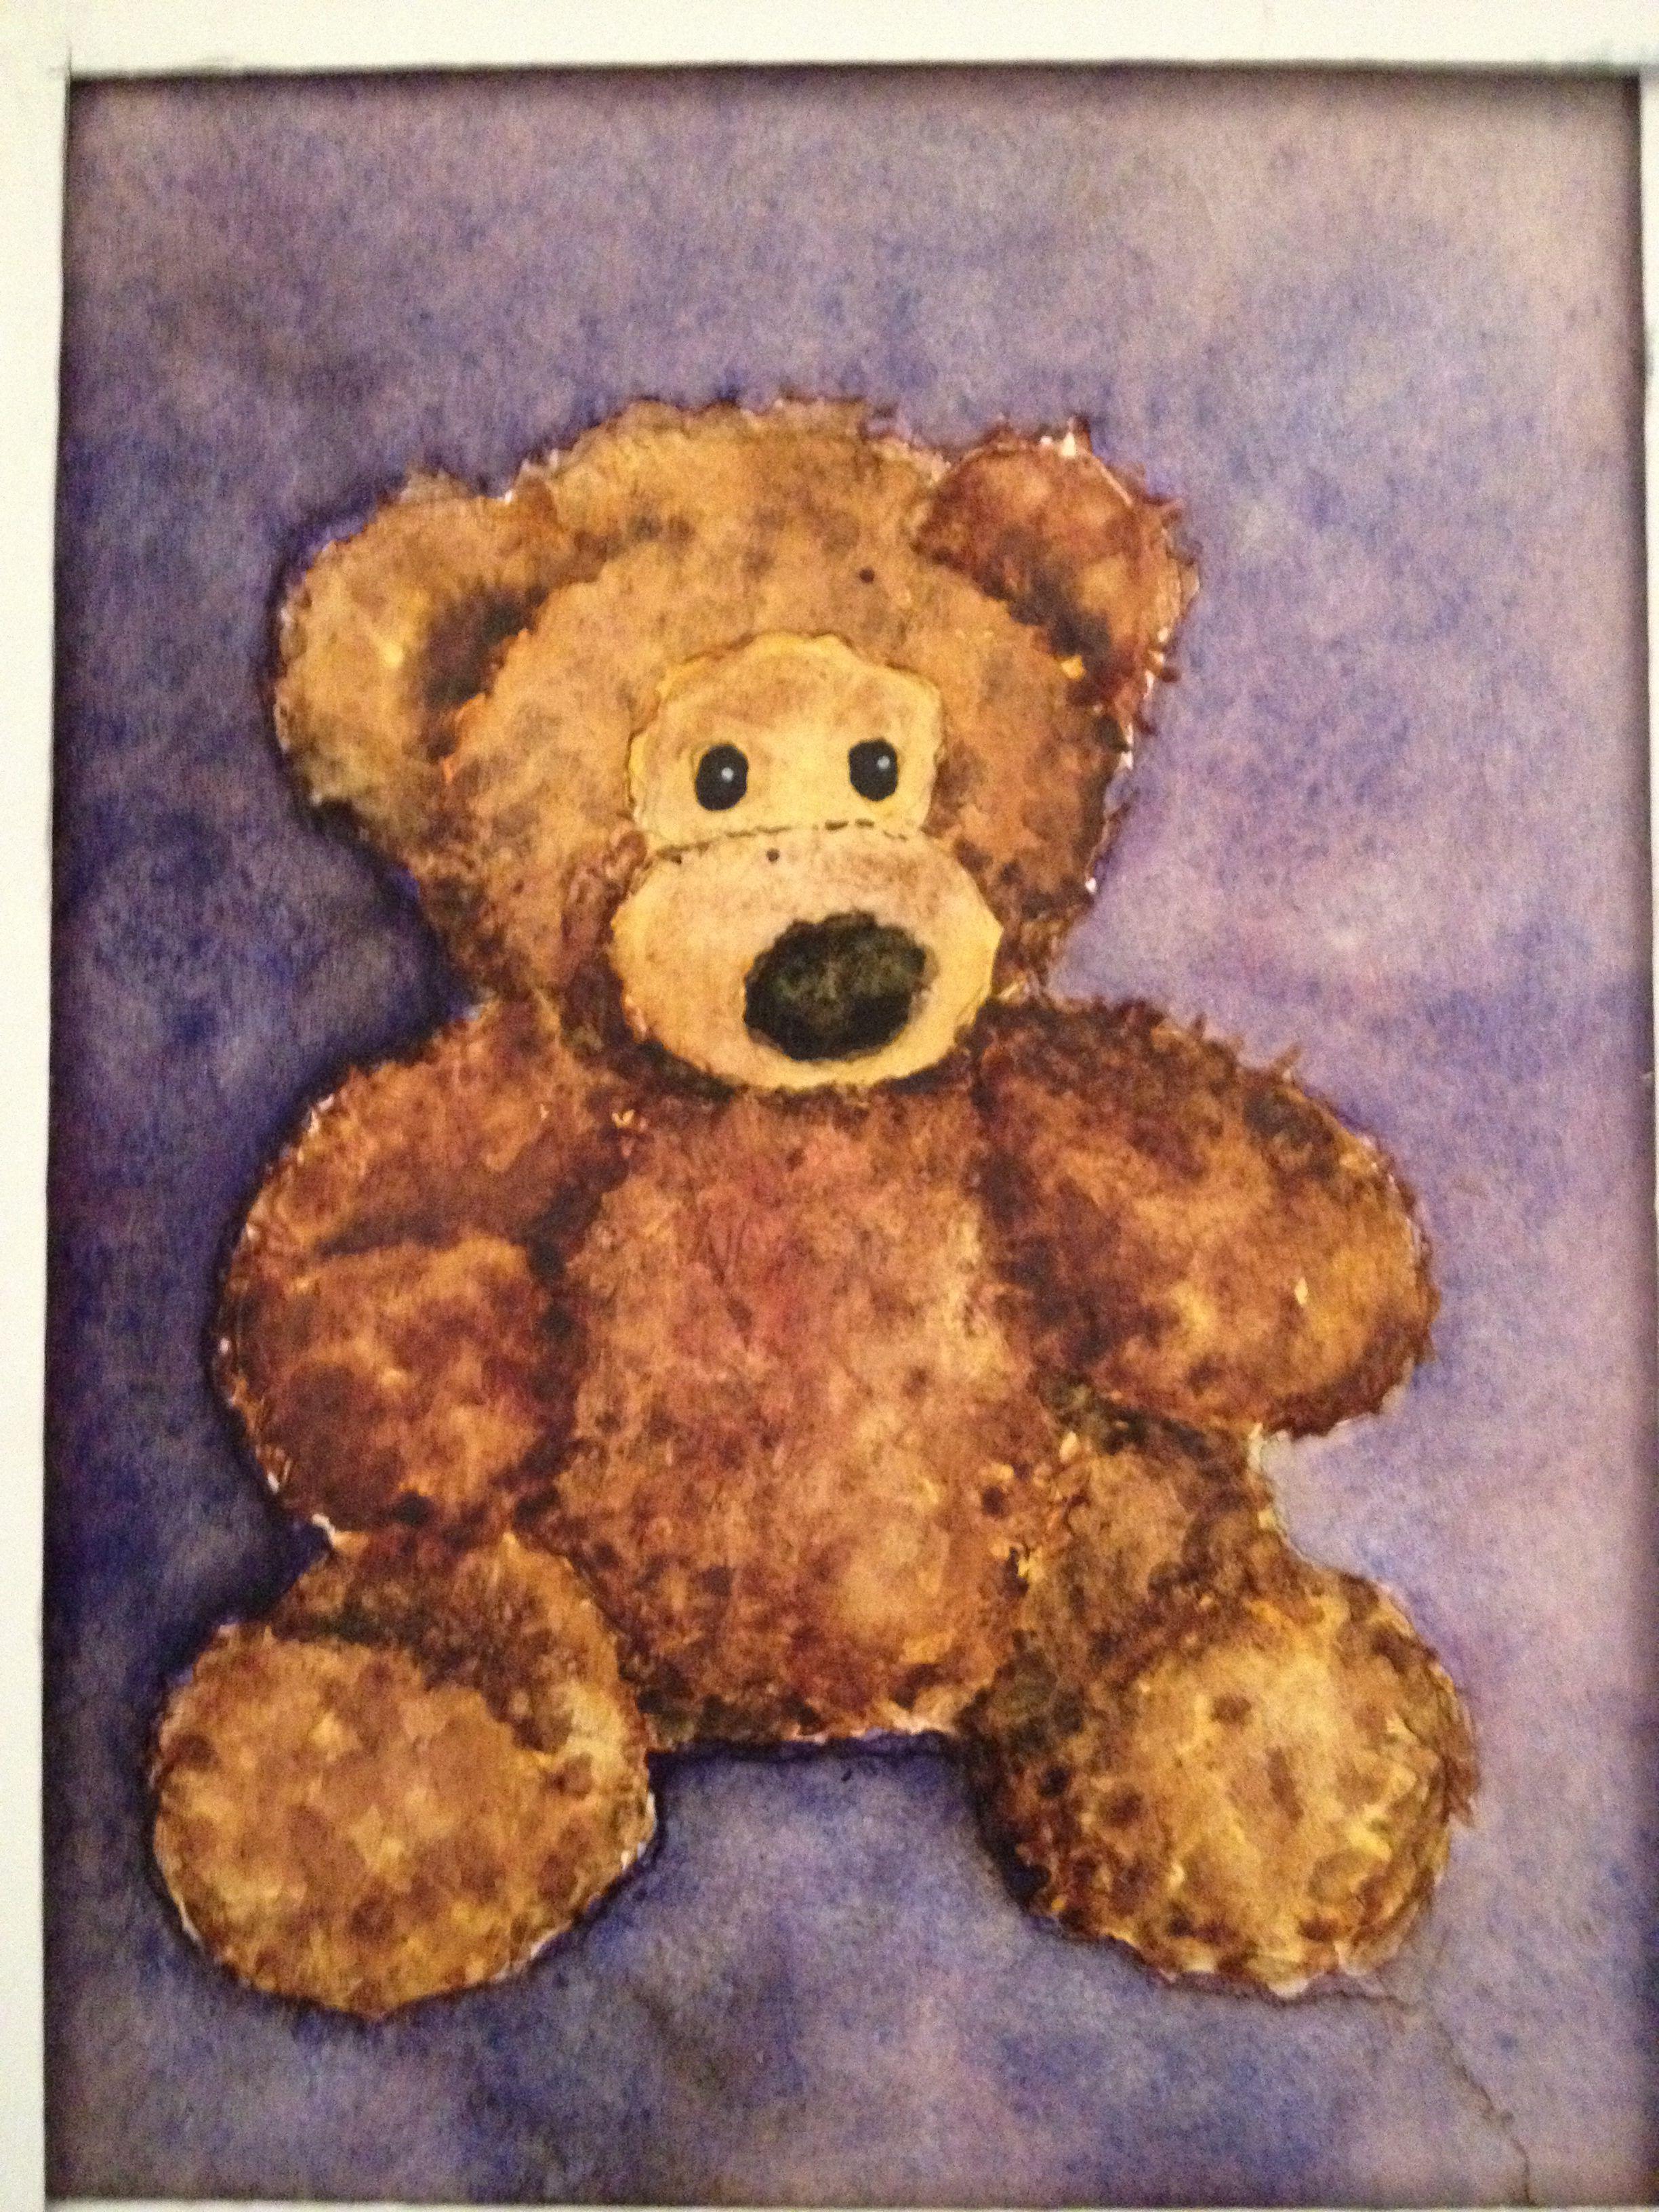 2448x3264 Watercolor Teddy Bear Watercolor Teddy Bears Teddy